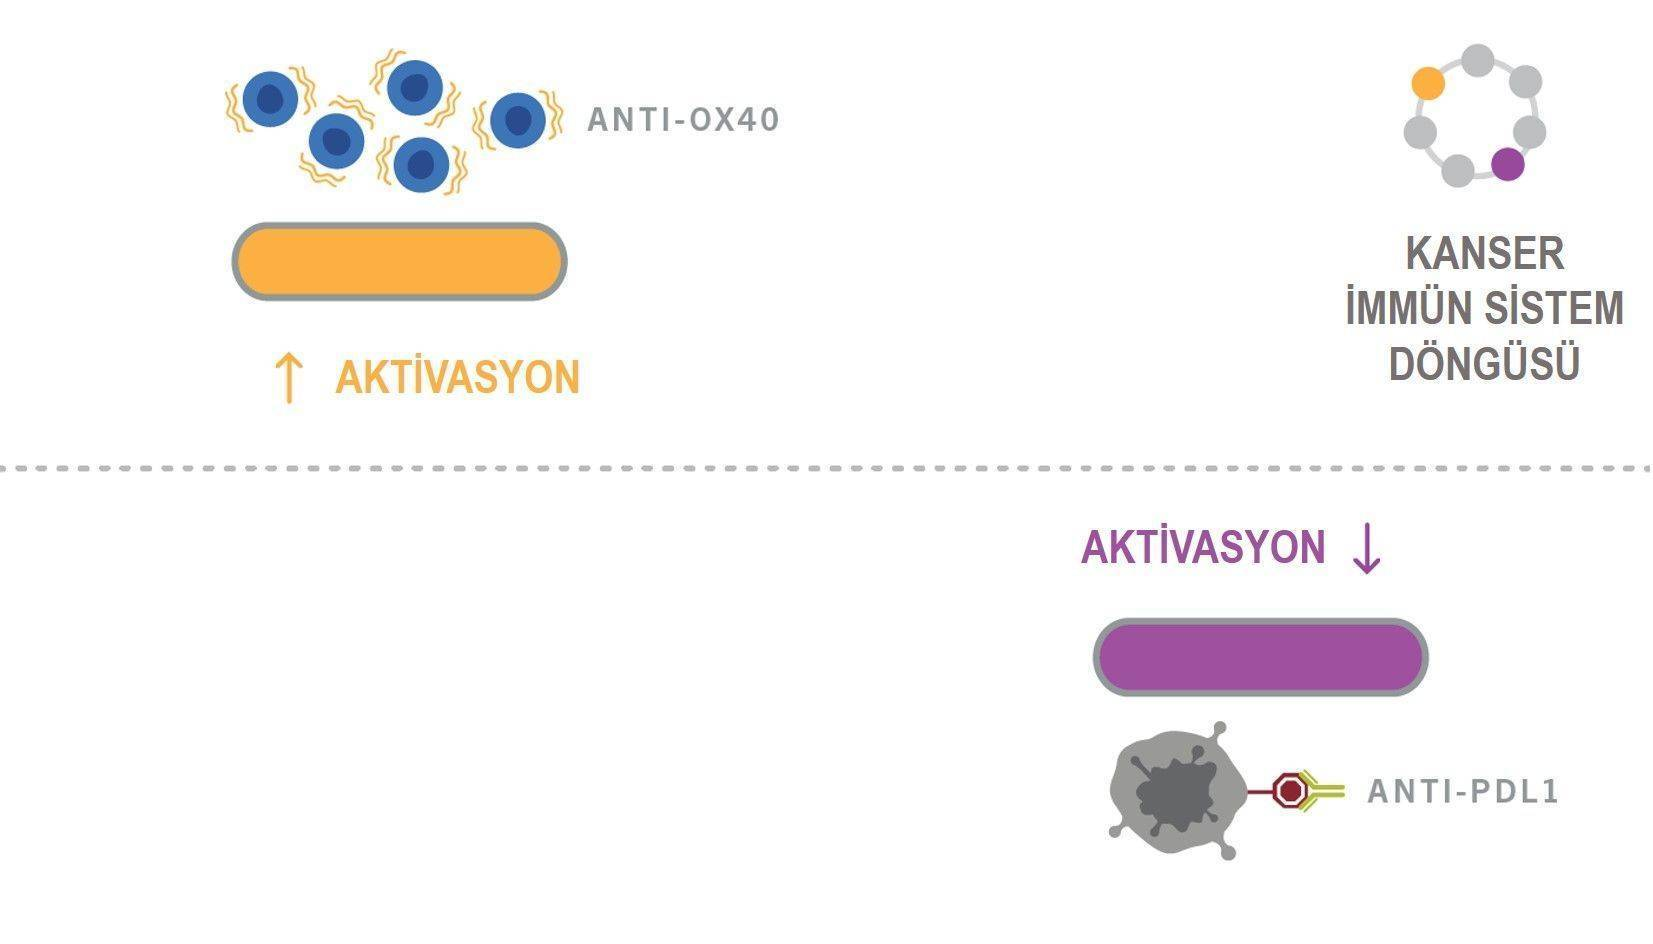 kanser immun sistem dongusu